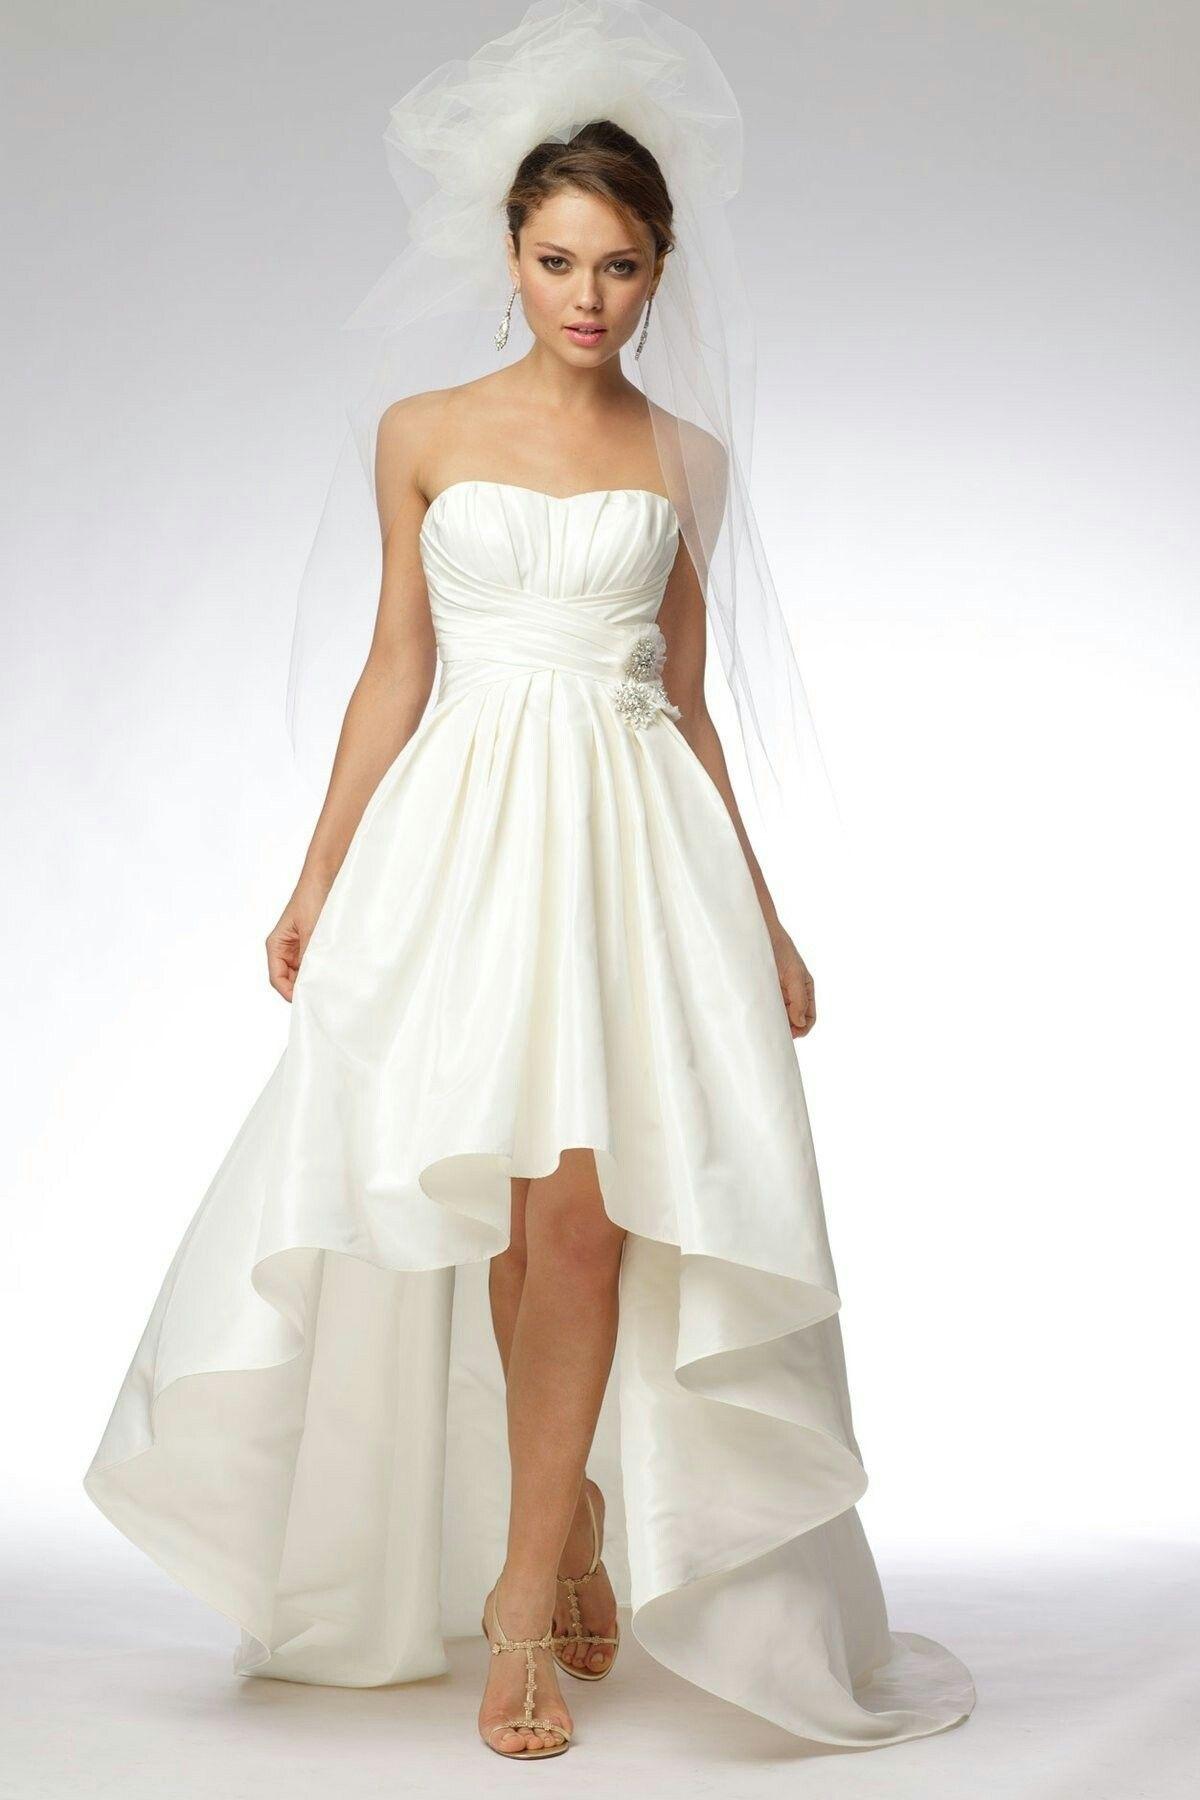 Pin by Thea Buford on wedding dresses | Pinterest | Wedding dress ...